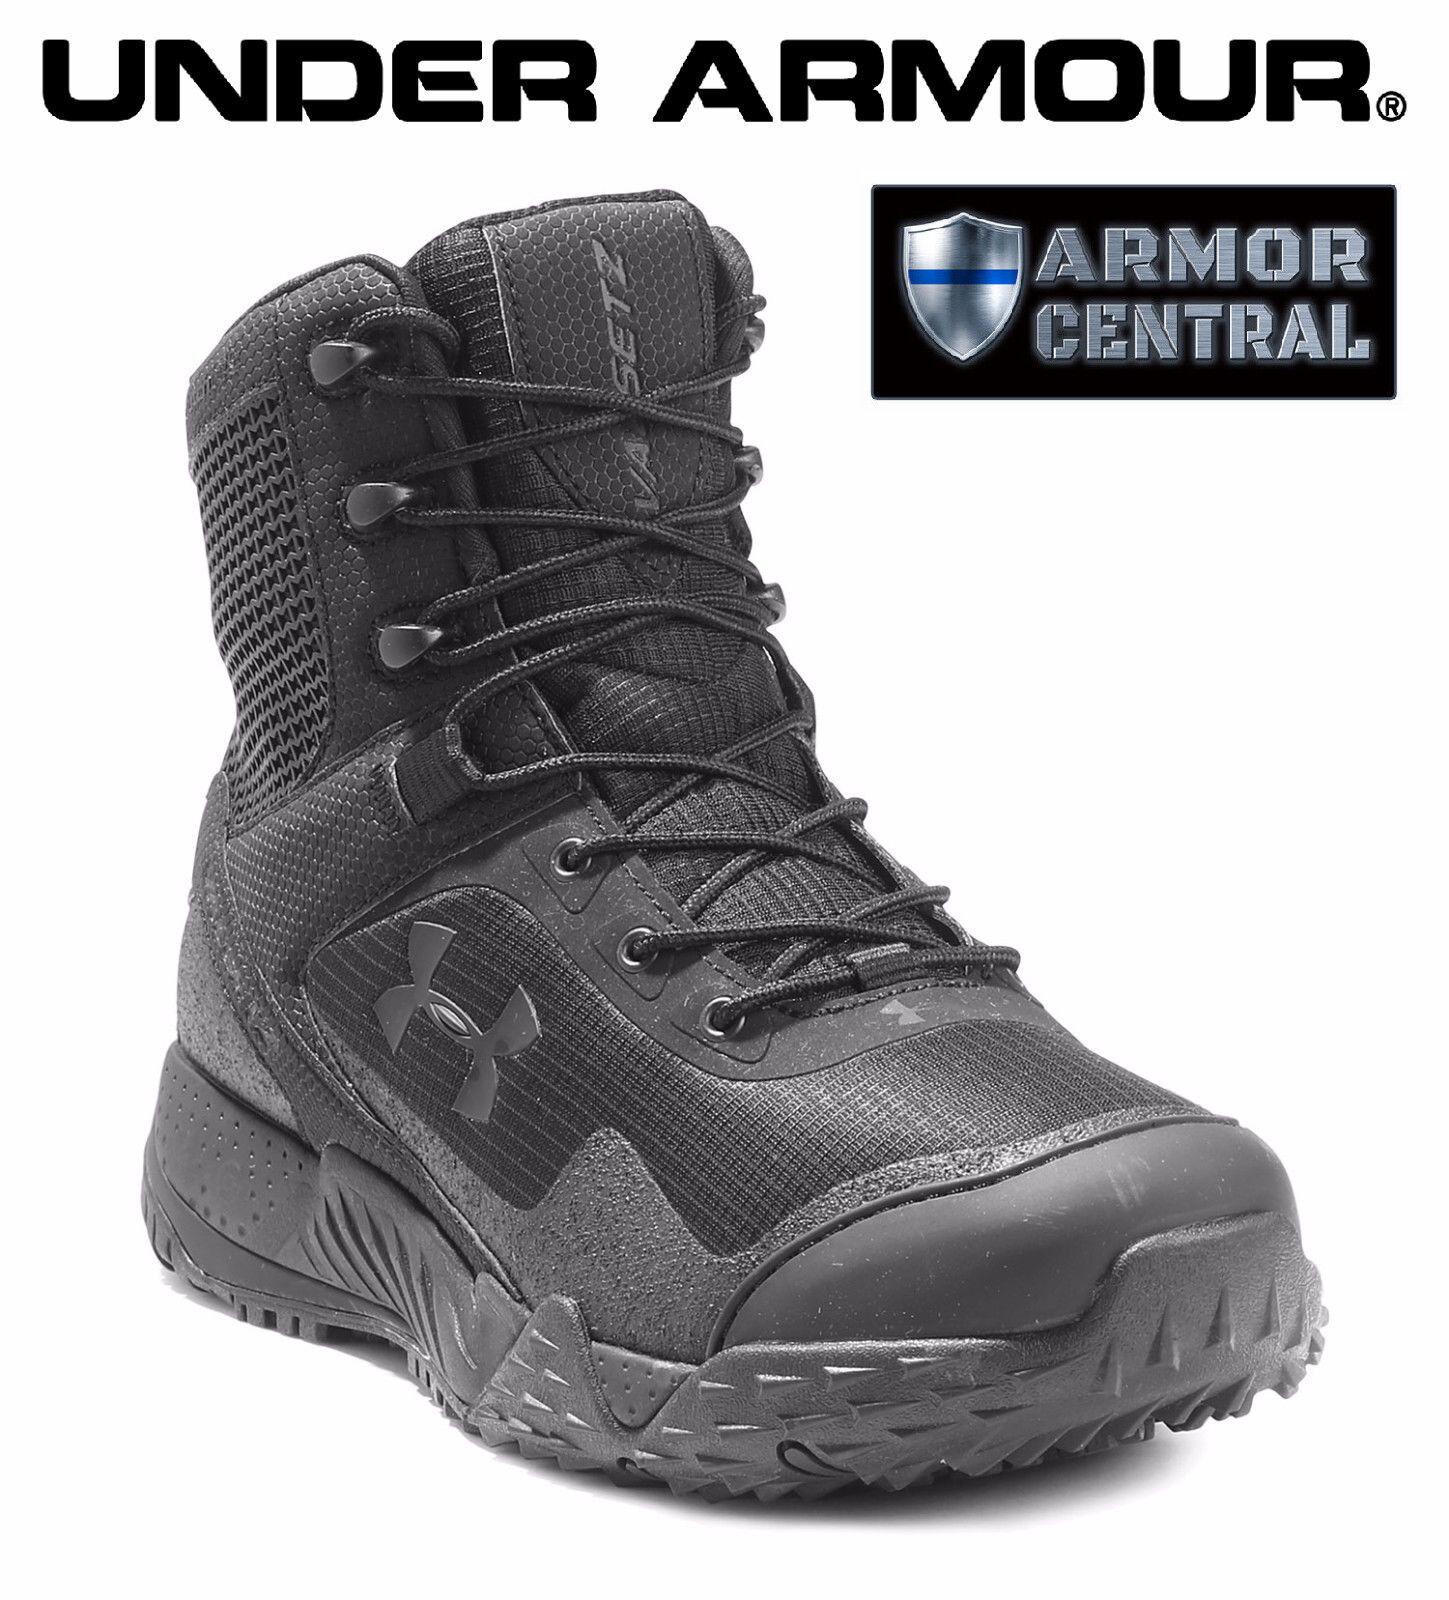 NEW Under Armour UA Men's Black VALSETZ 1.5 Tactical Side Zip Boots - 3021036